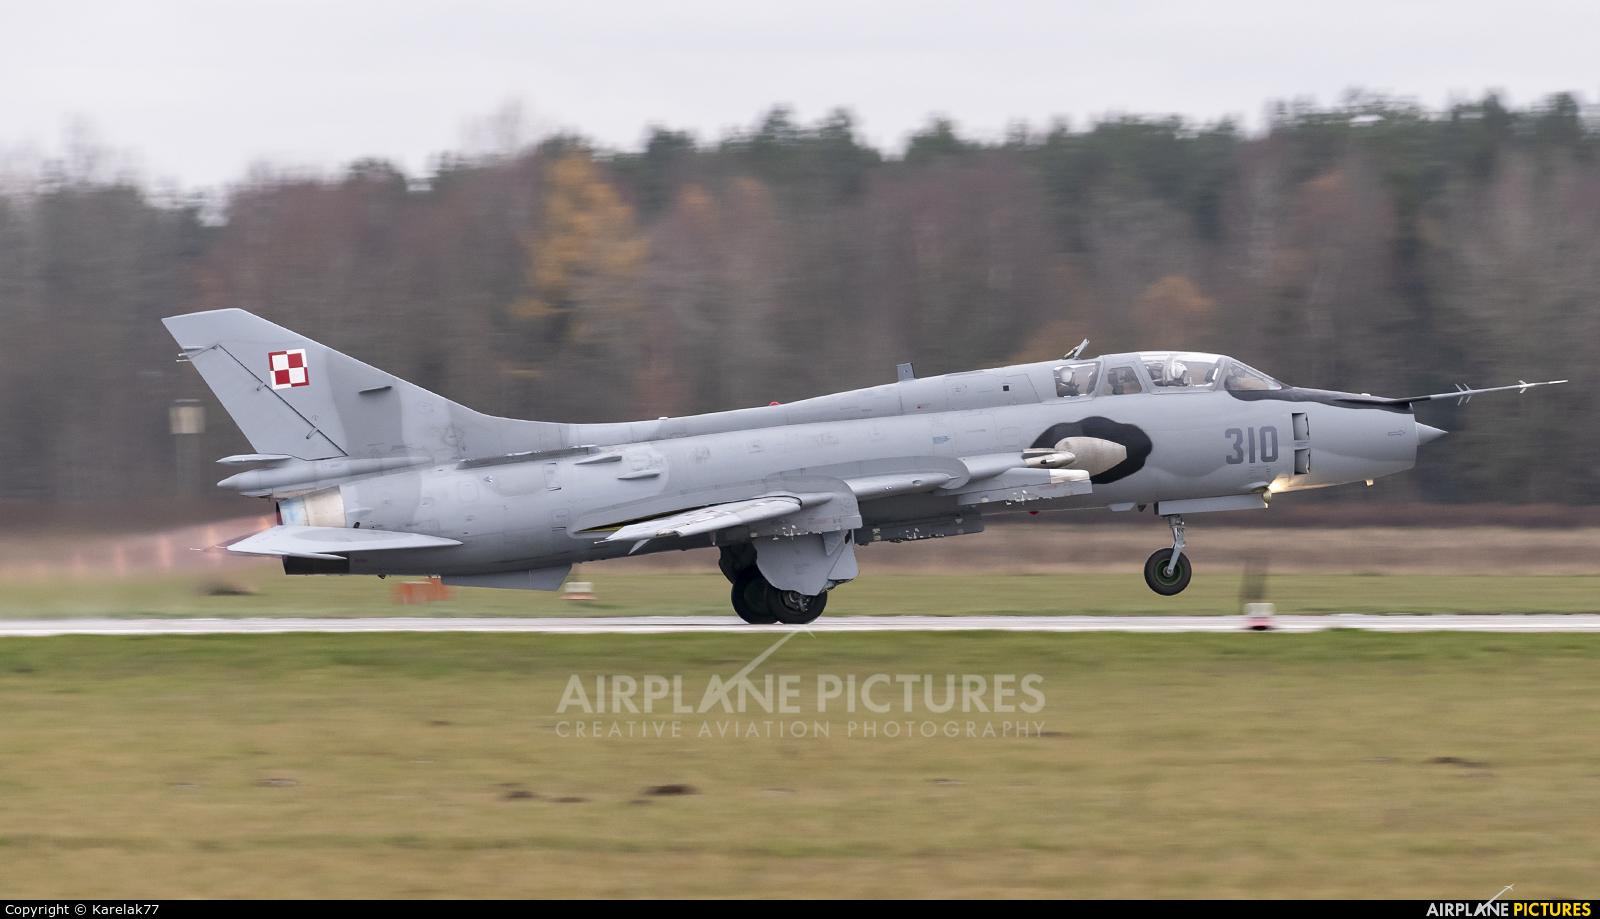 Poland - Air Force 310 aircraft at Świdwin